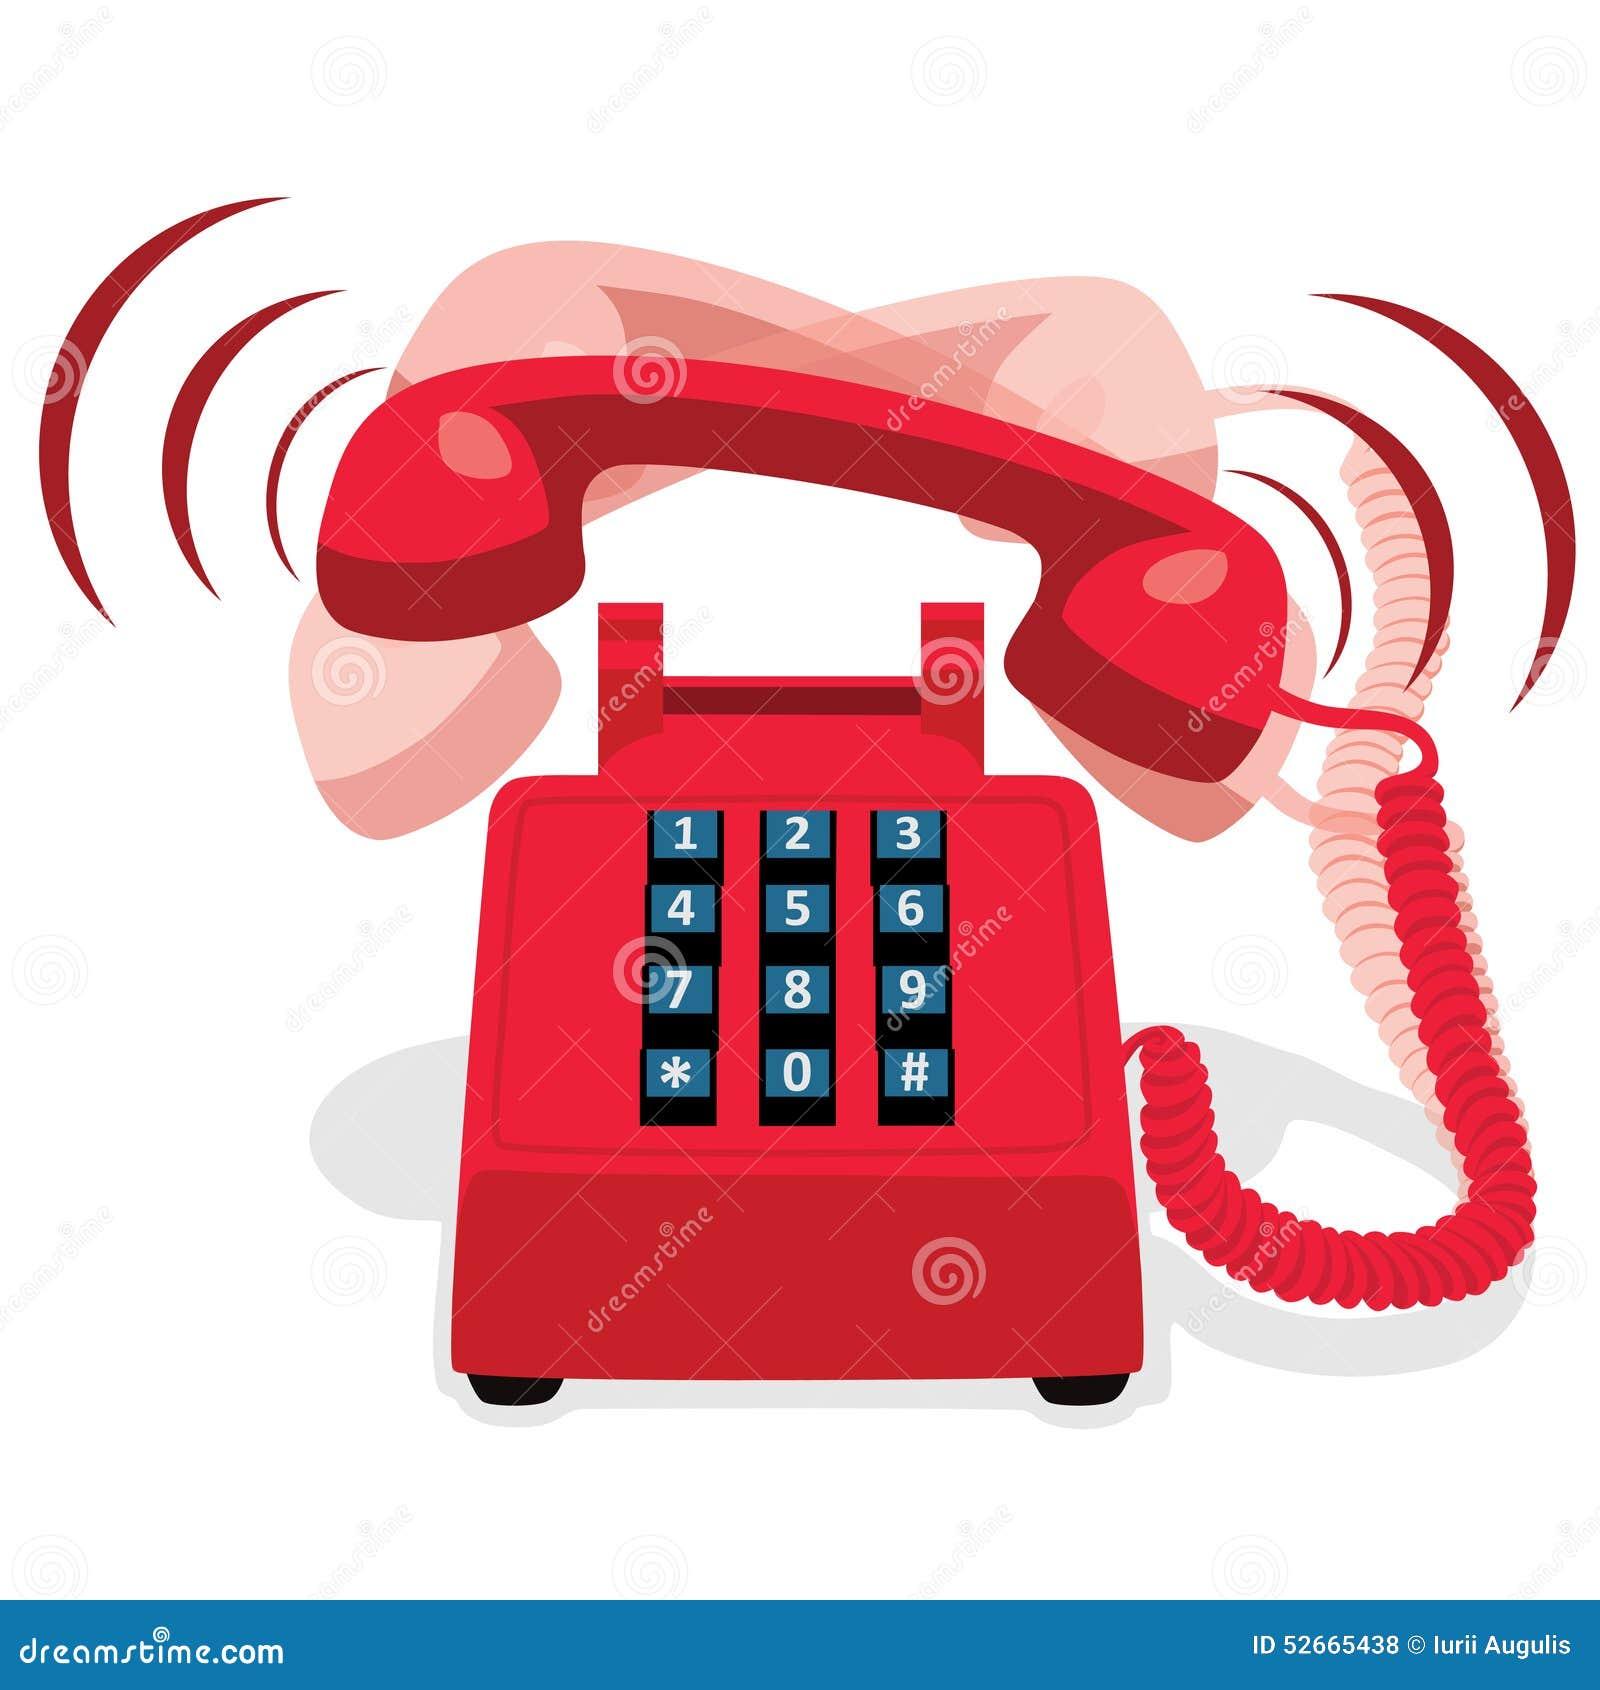 clip art of phone ringing - photo #38